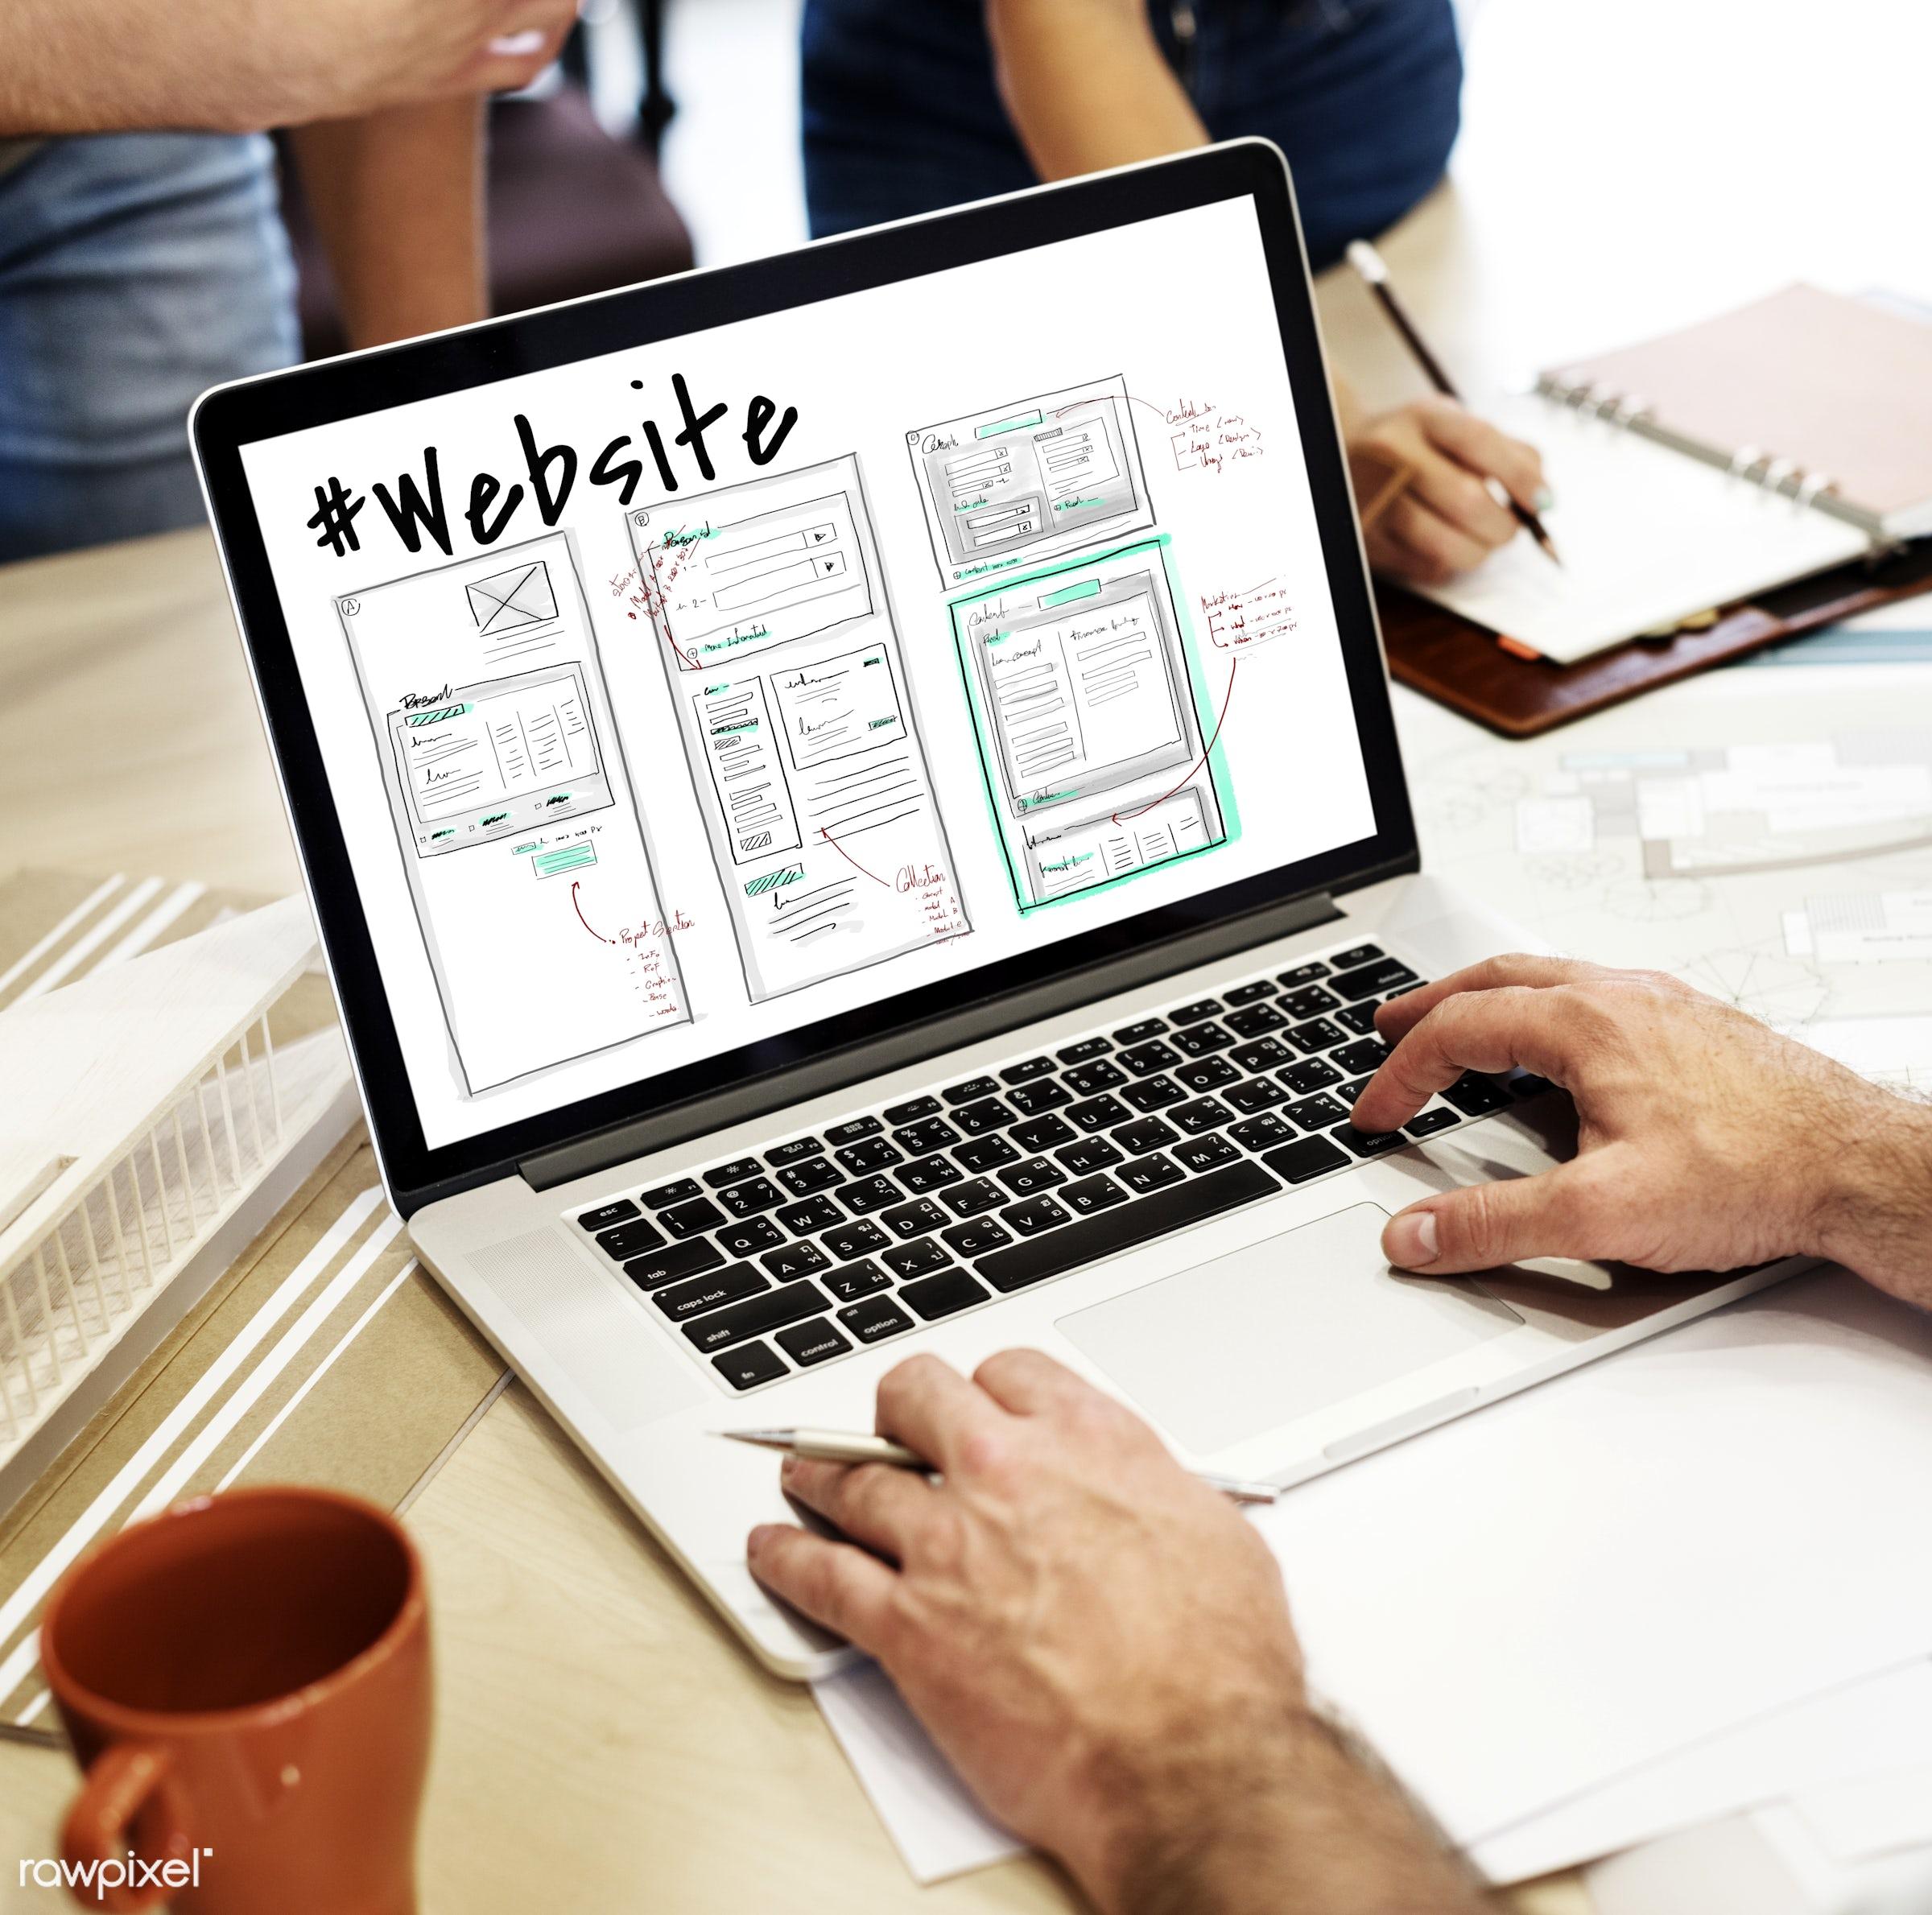 architect, architecture, art, blueprint, coffee, coffee cup, content, cup, design, designing, development, device, digital...